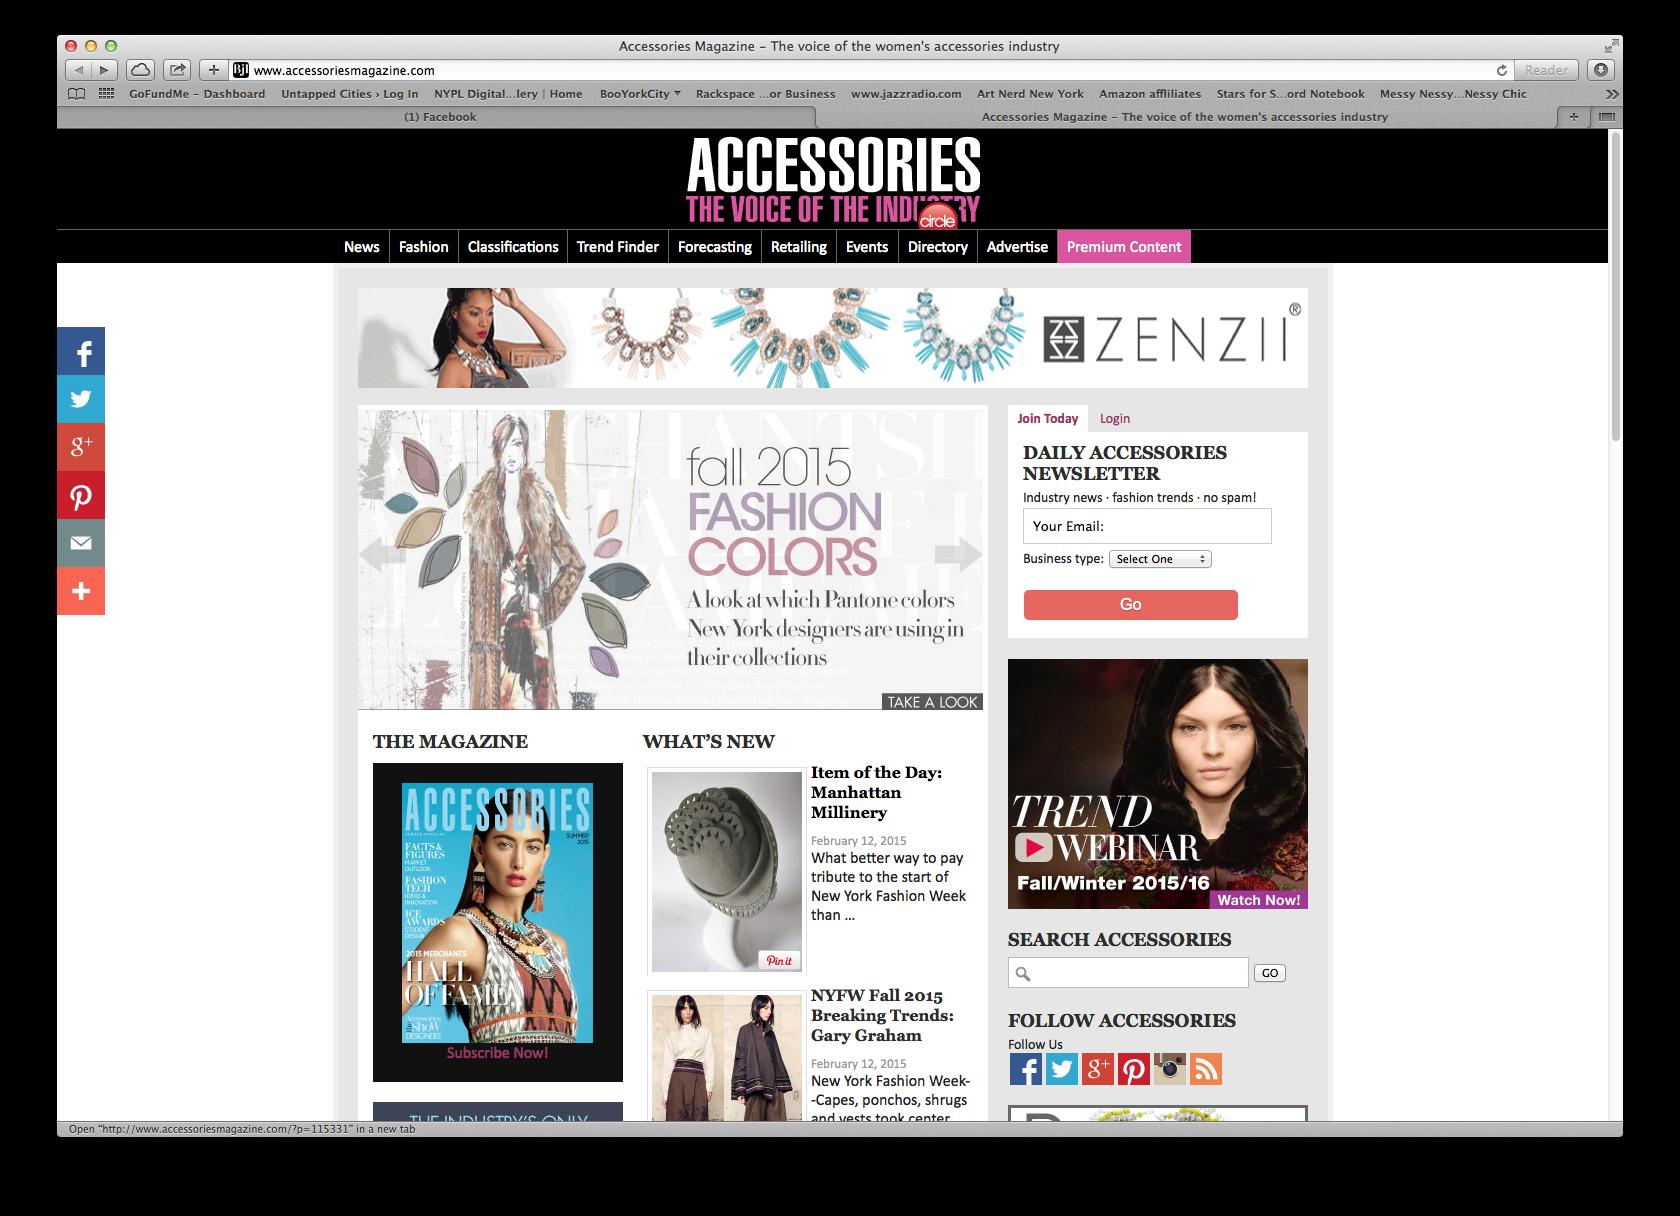 Accessories Magazine - feature